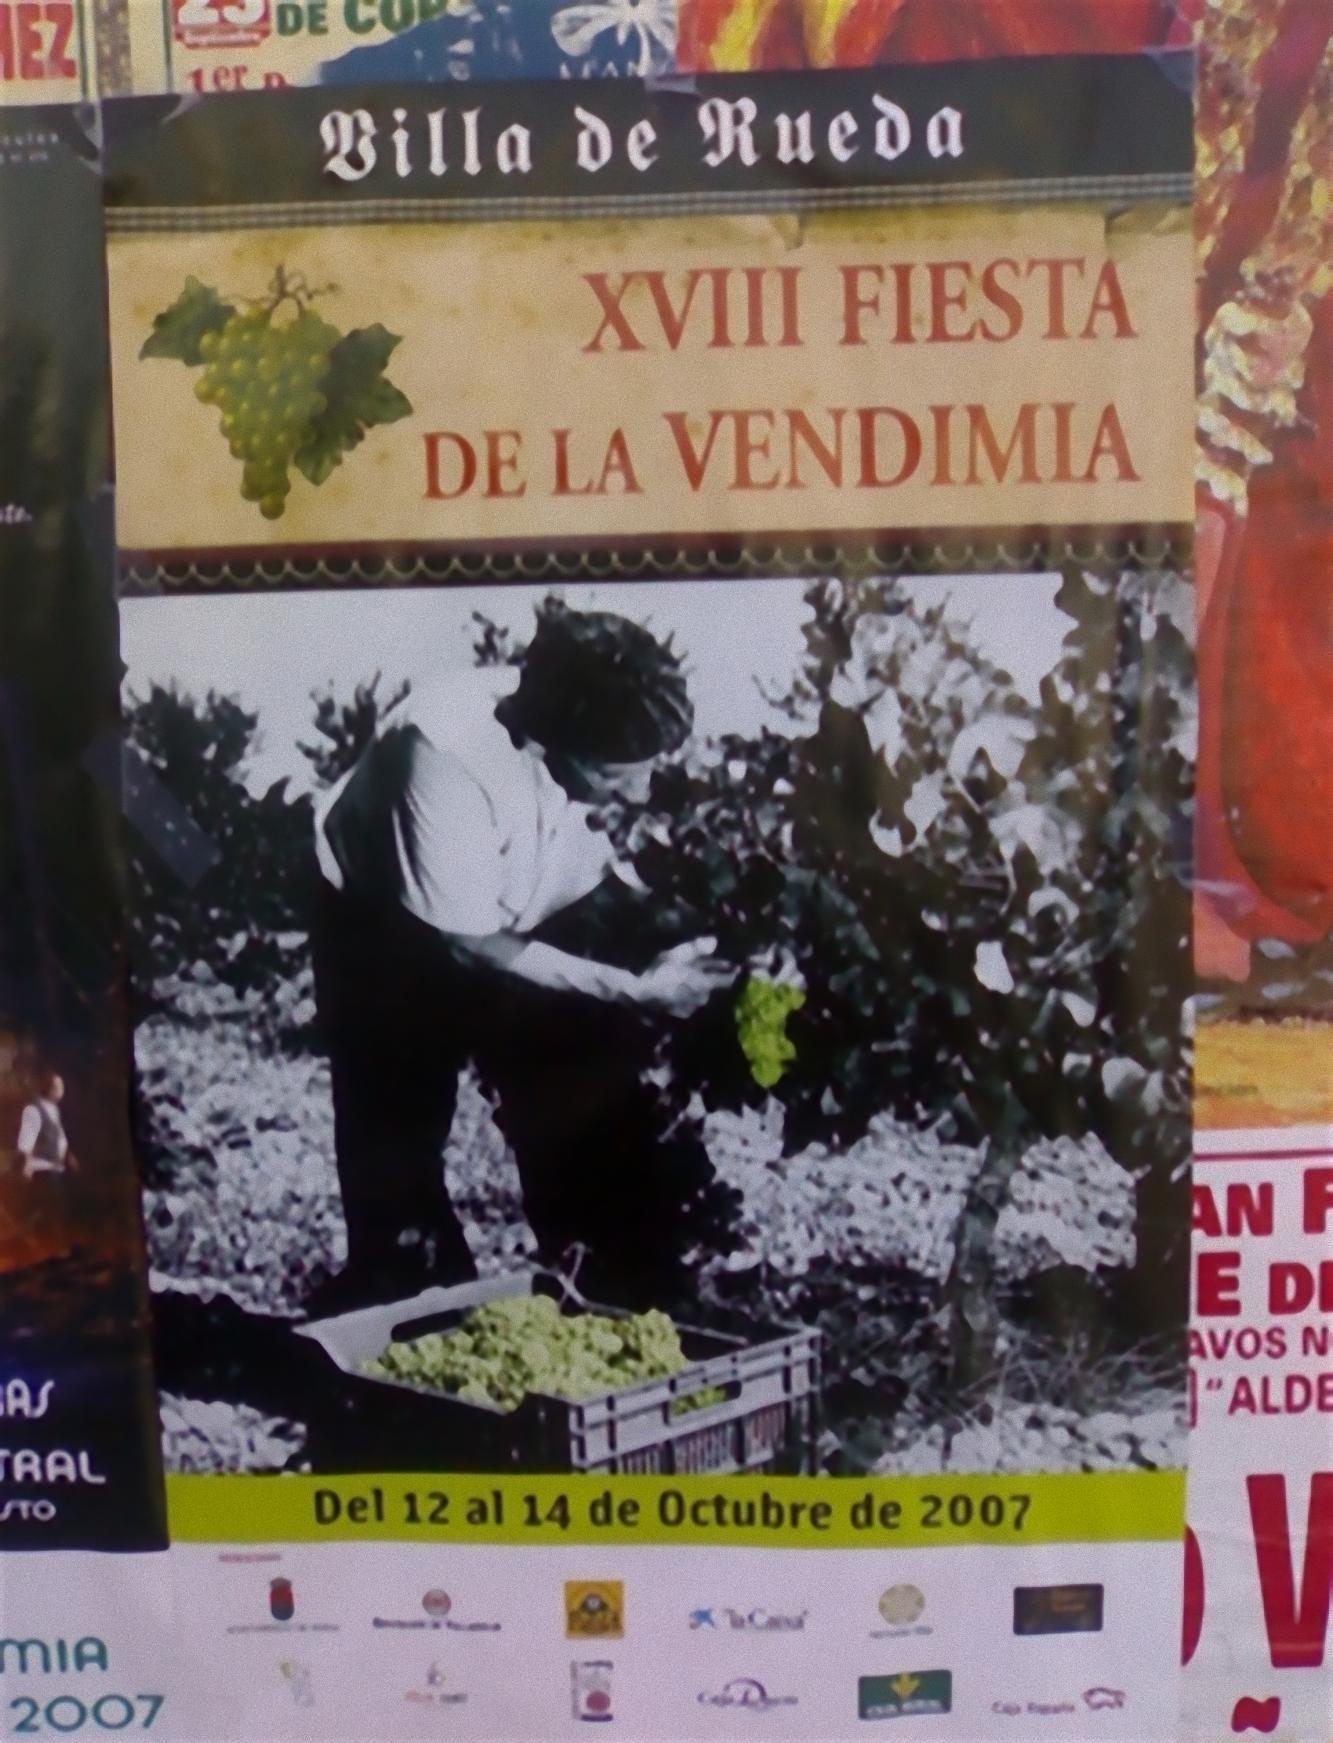 Cartel de la XVIII Fiesta de la Vendimia D.O.Rueda